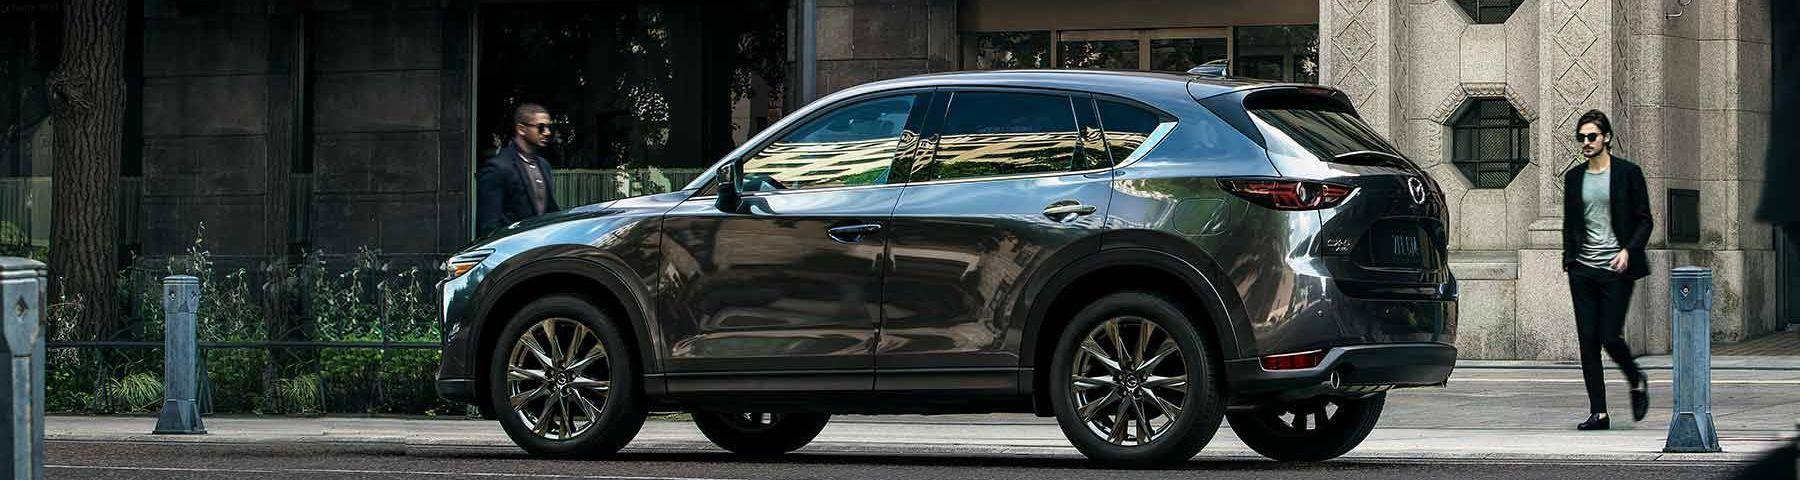 2019 Mazda CX-5 for Sale near Houston, TX